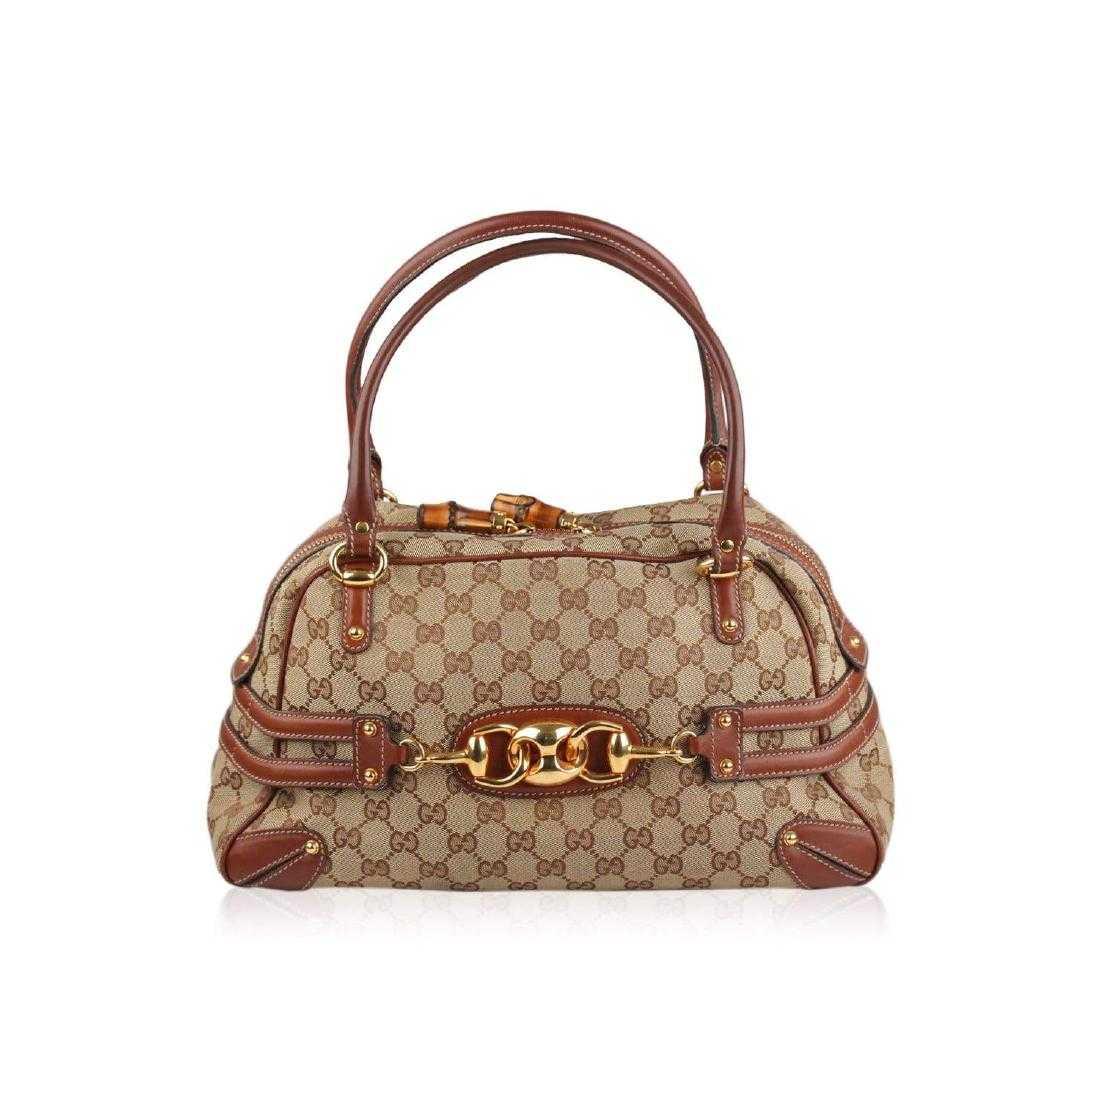 202ab3d56f6 Gucci Wave Boston Bag Satchel